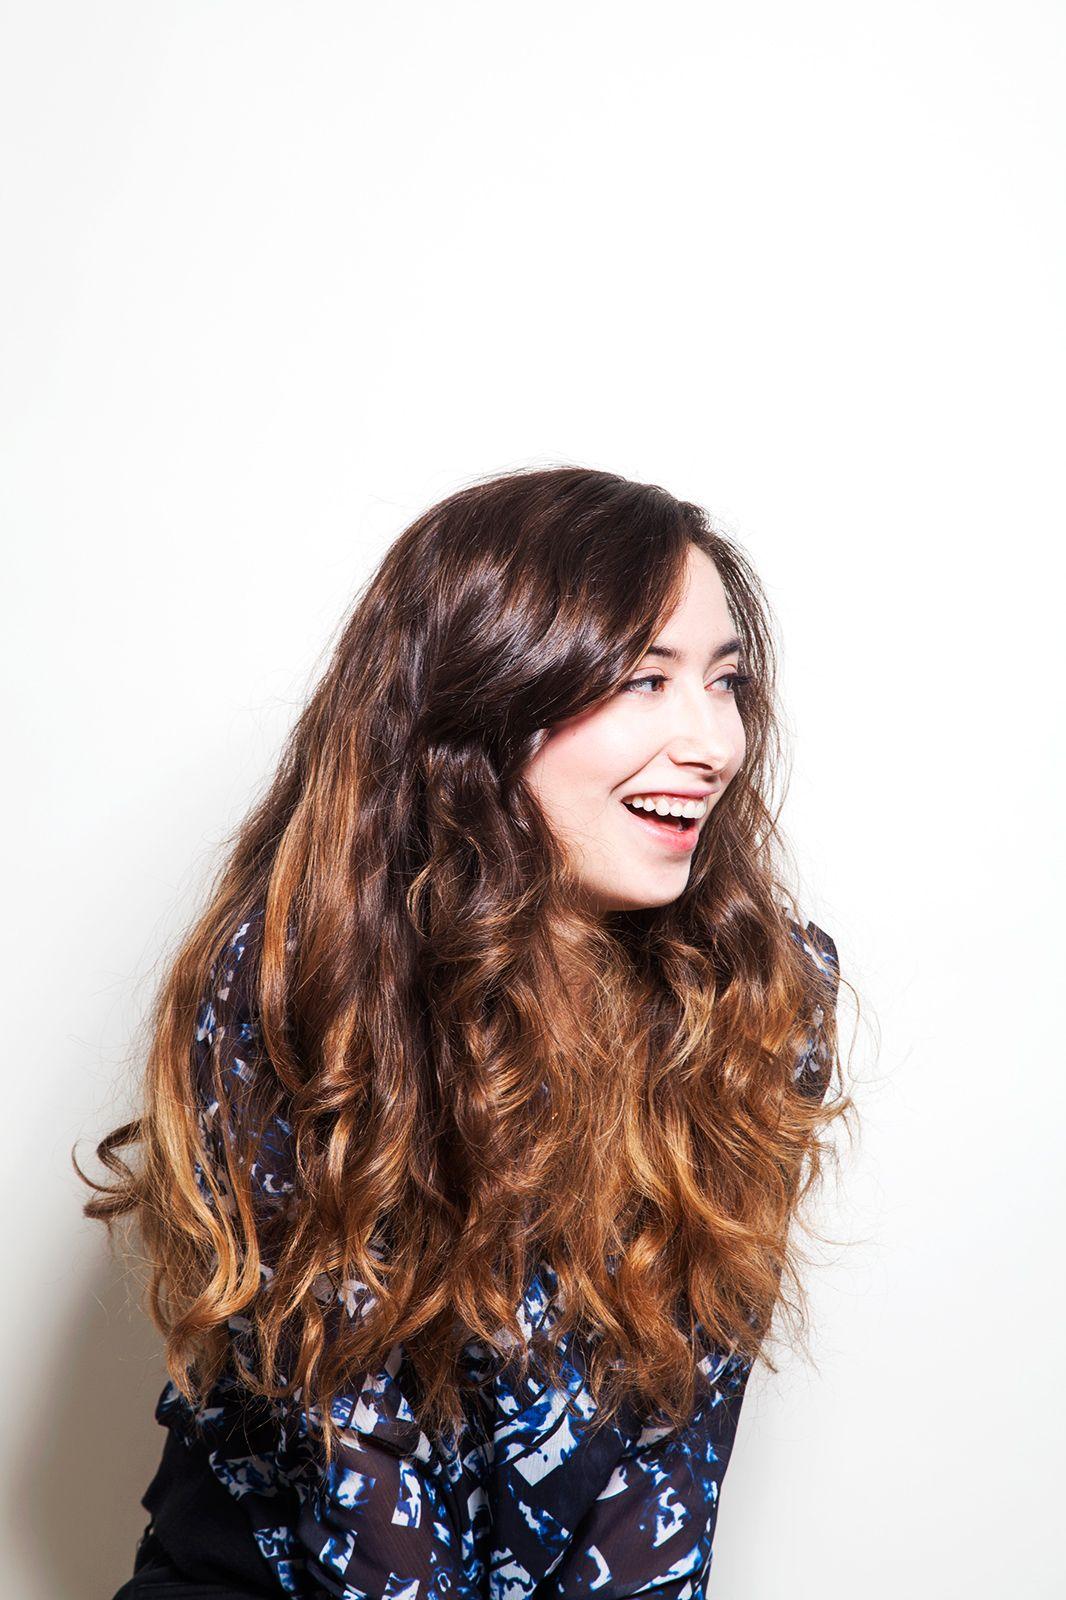 Overnight hair tips style tricks advice beautiful hair how to